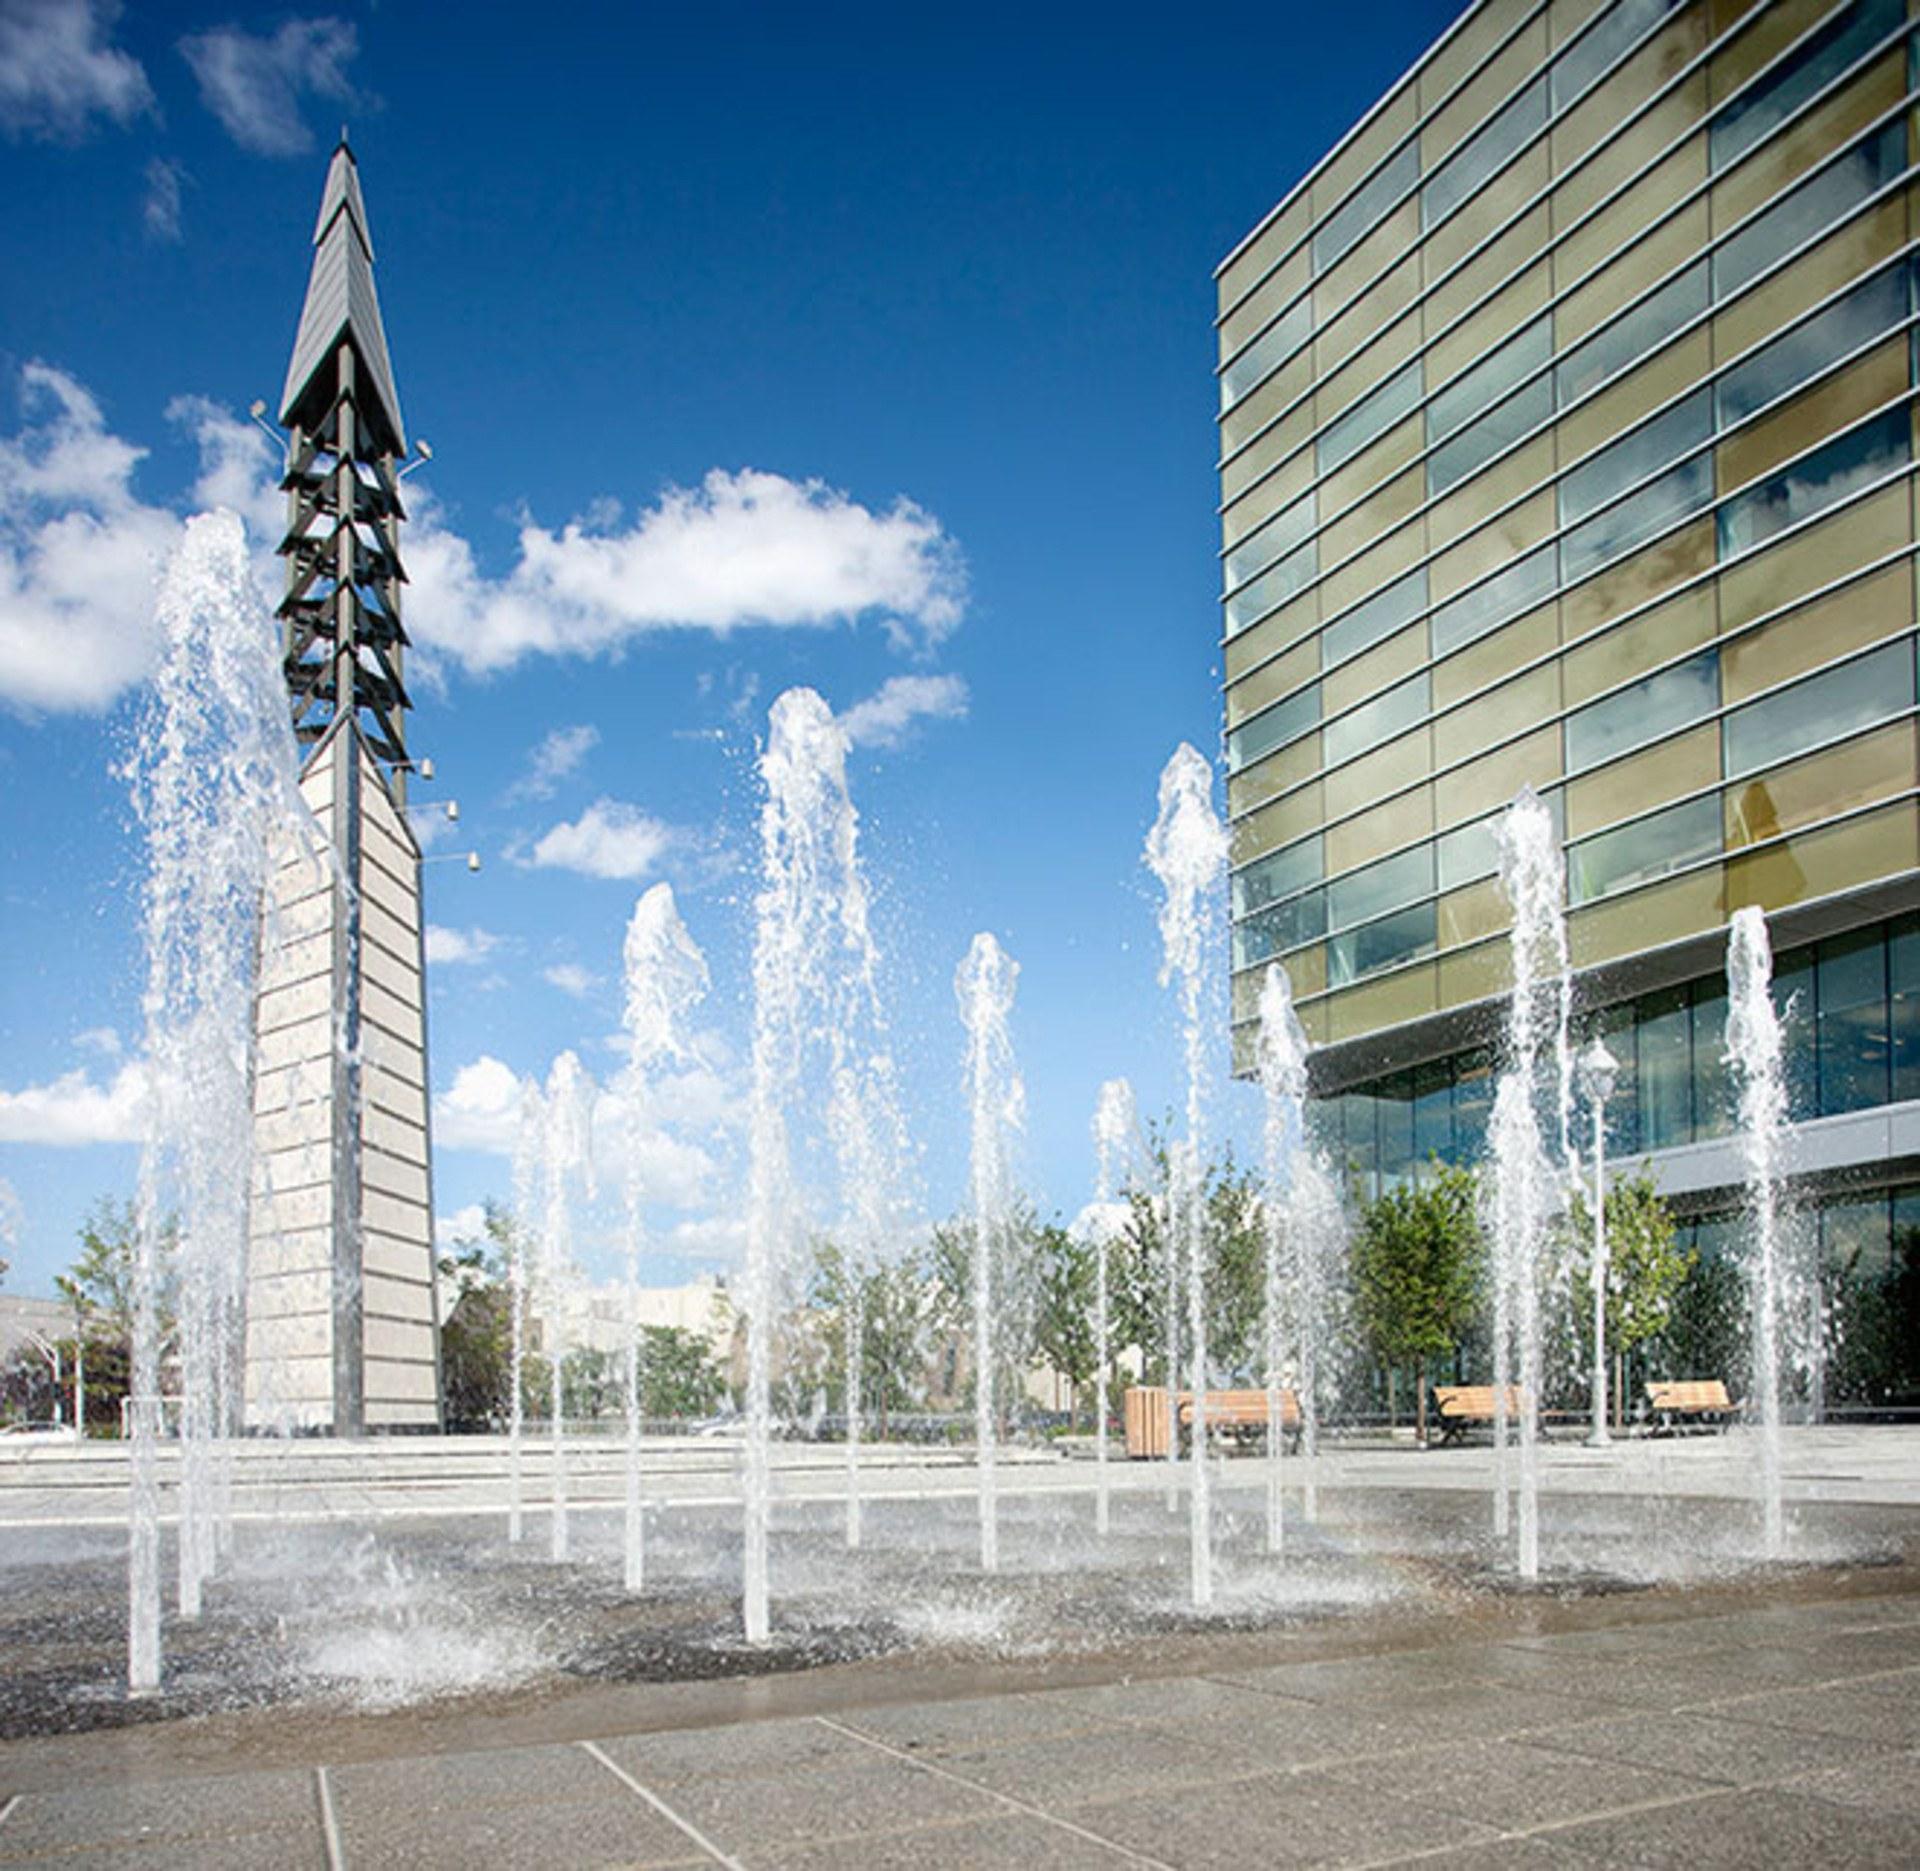 universite-montreal-campus-laval-hotel-laval